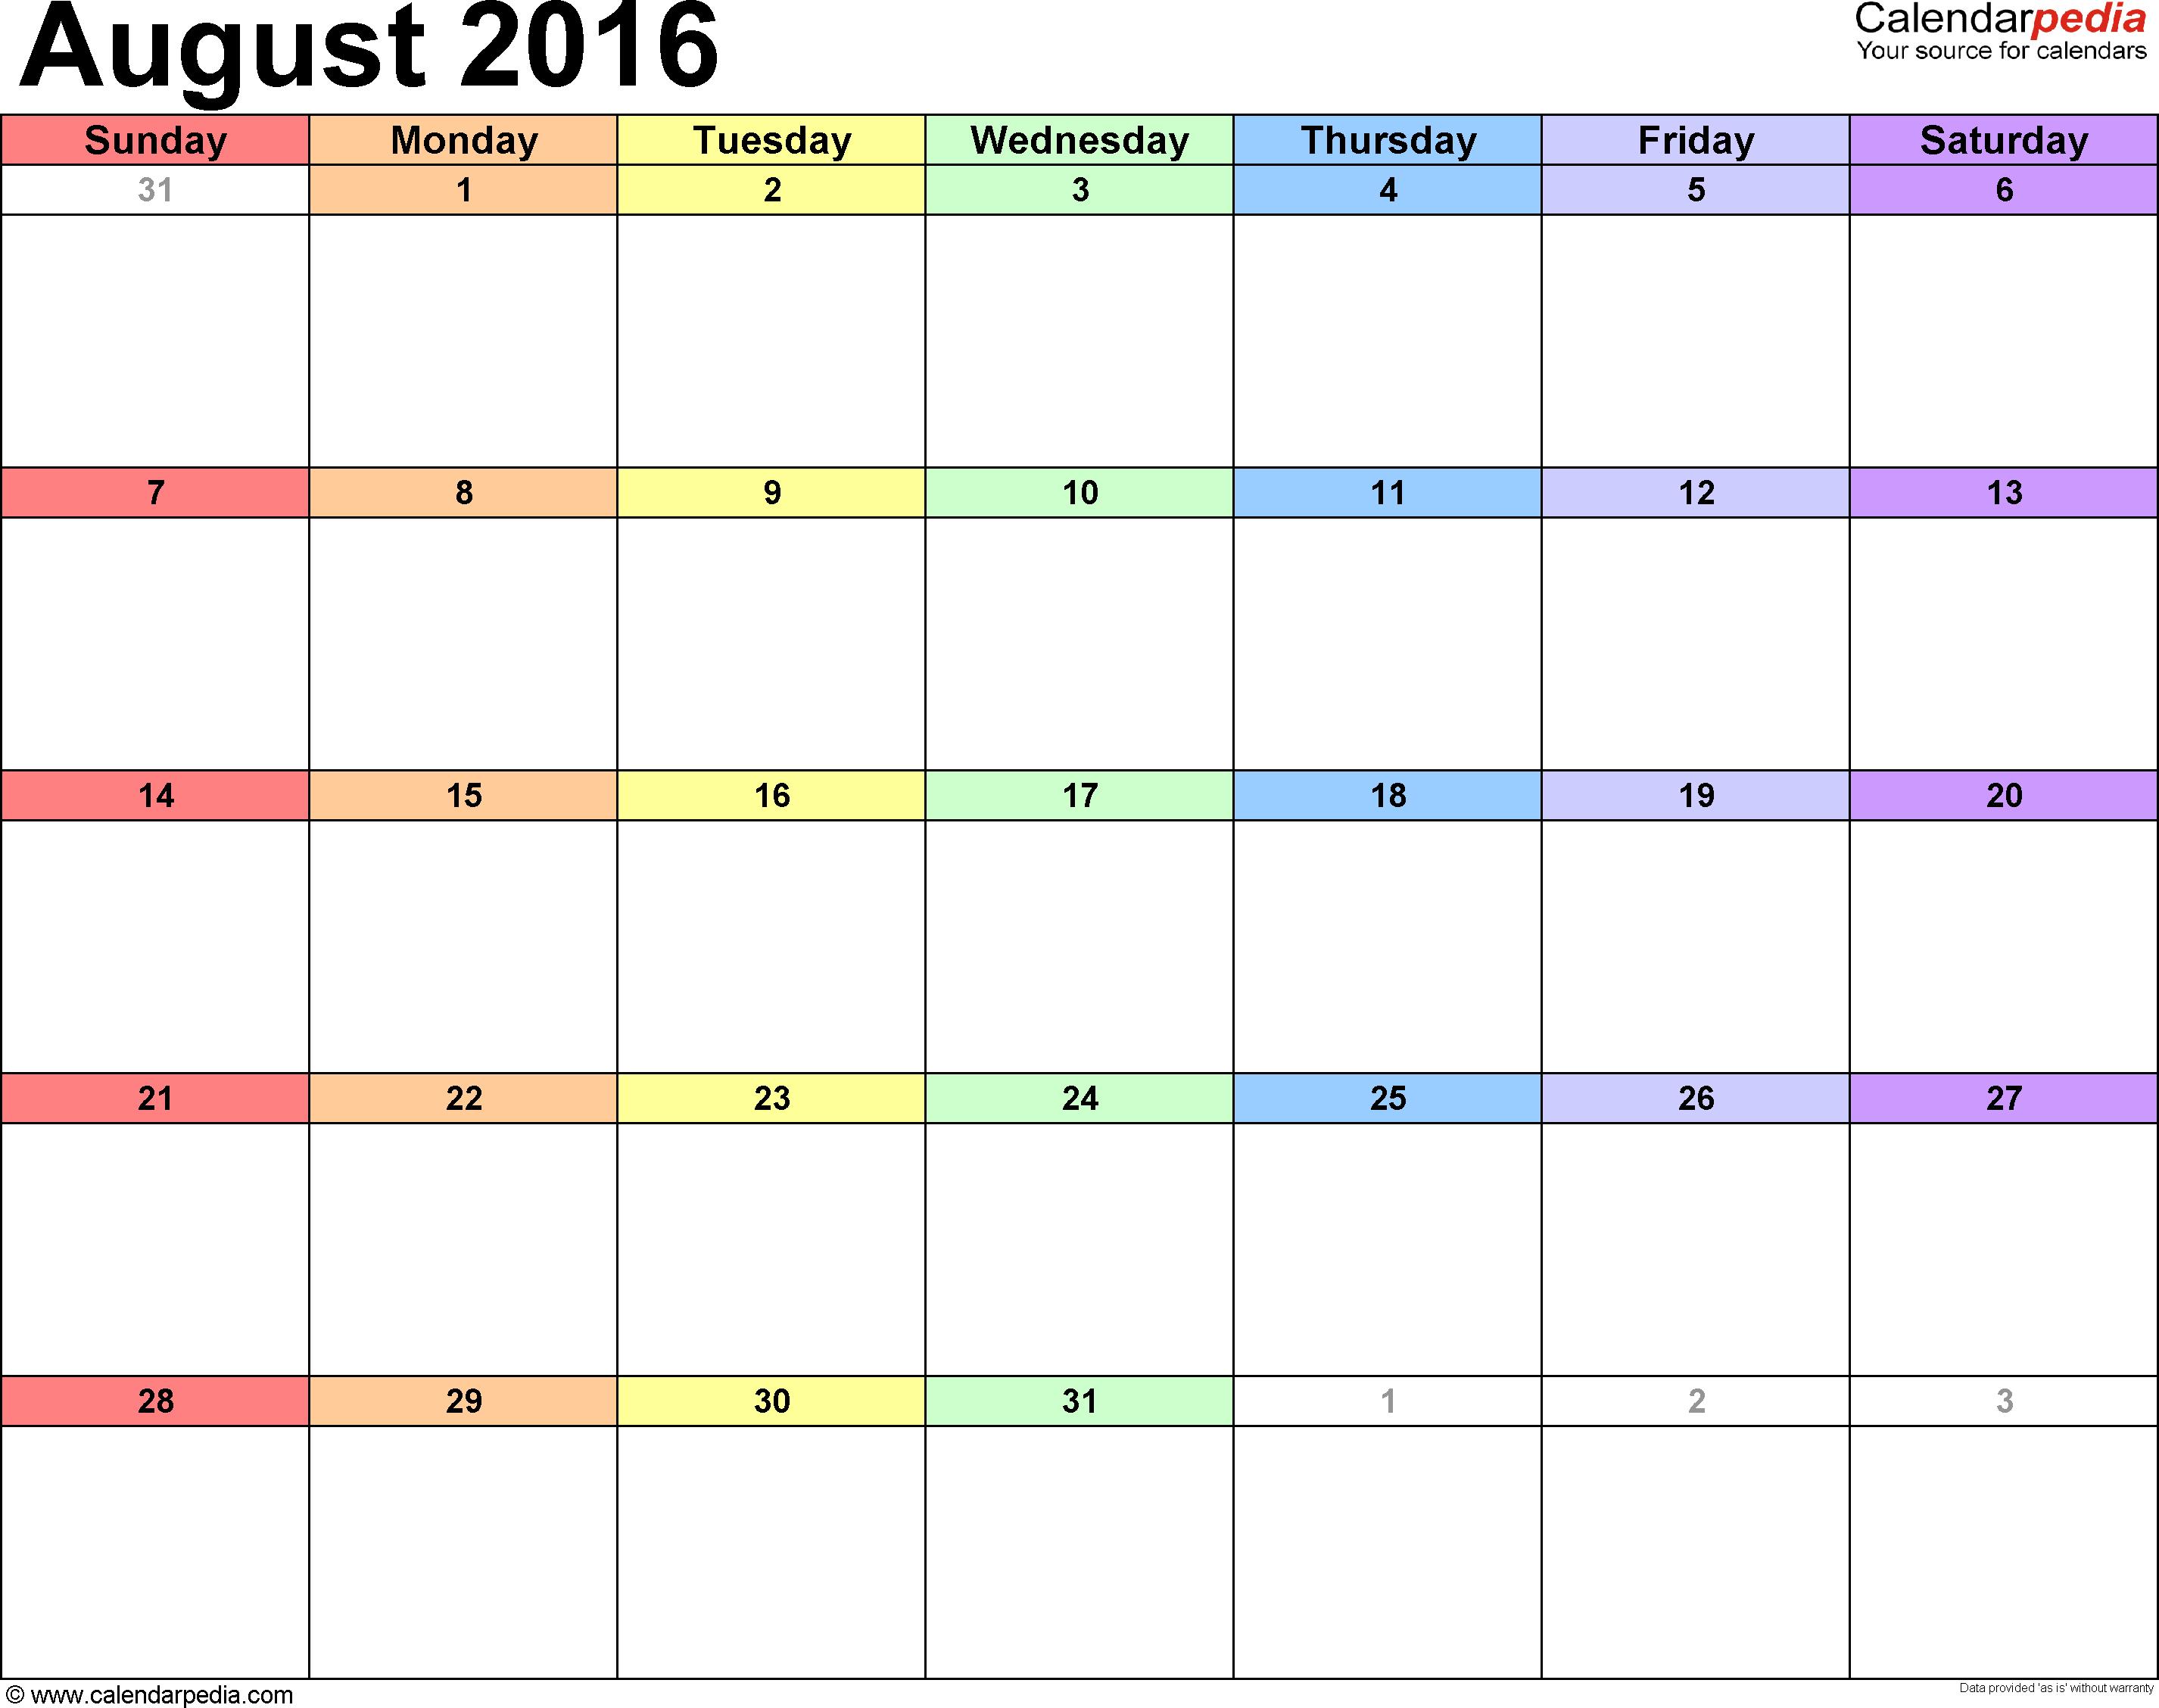 August 2016 calendar printable template